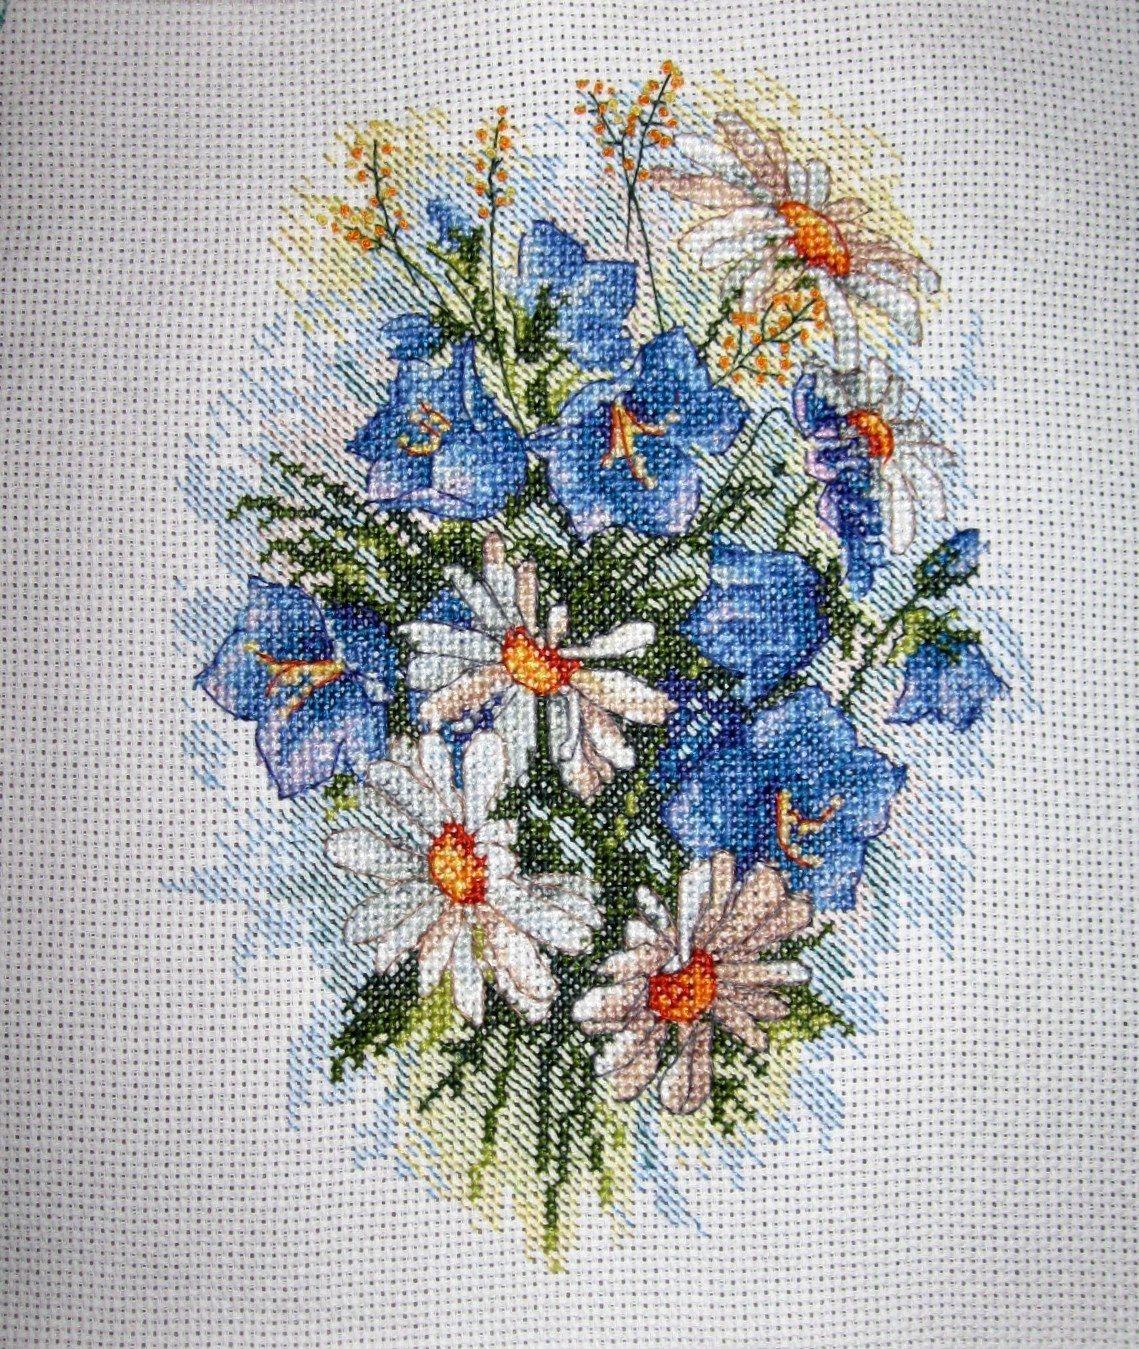 Набор для вышивания М-120 Луговые цветы Жар-птица